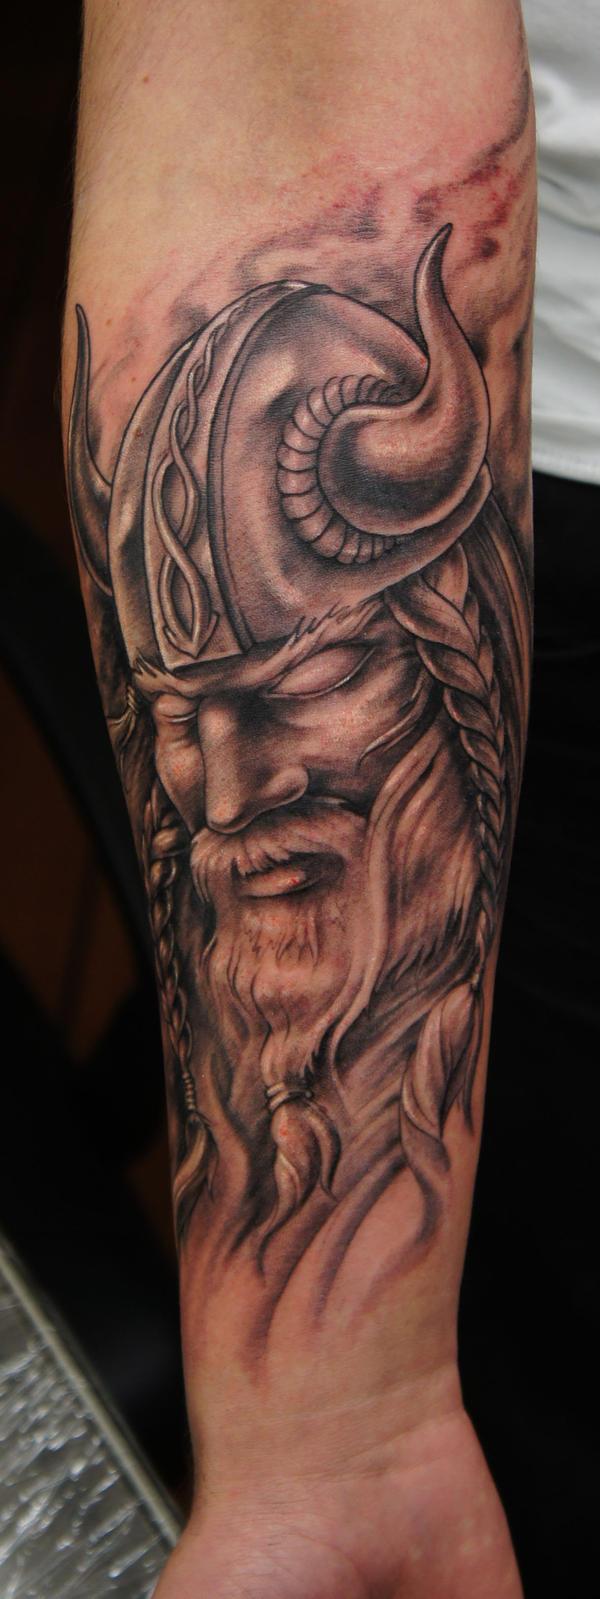 Viking tatt by strangeris on deviantart for Did vikings have tattoos